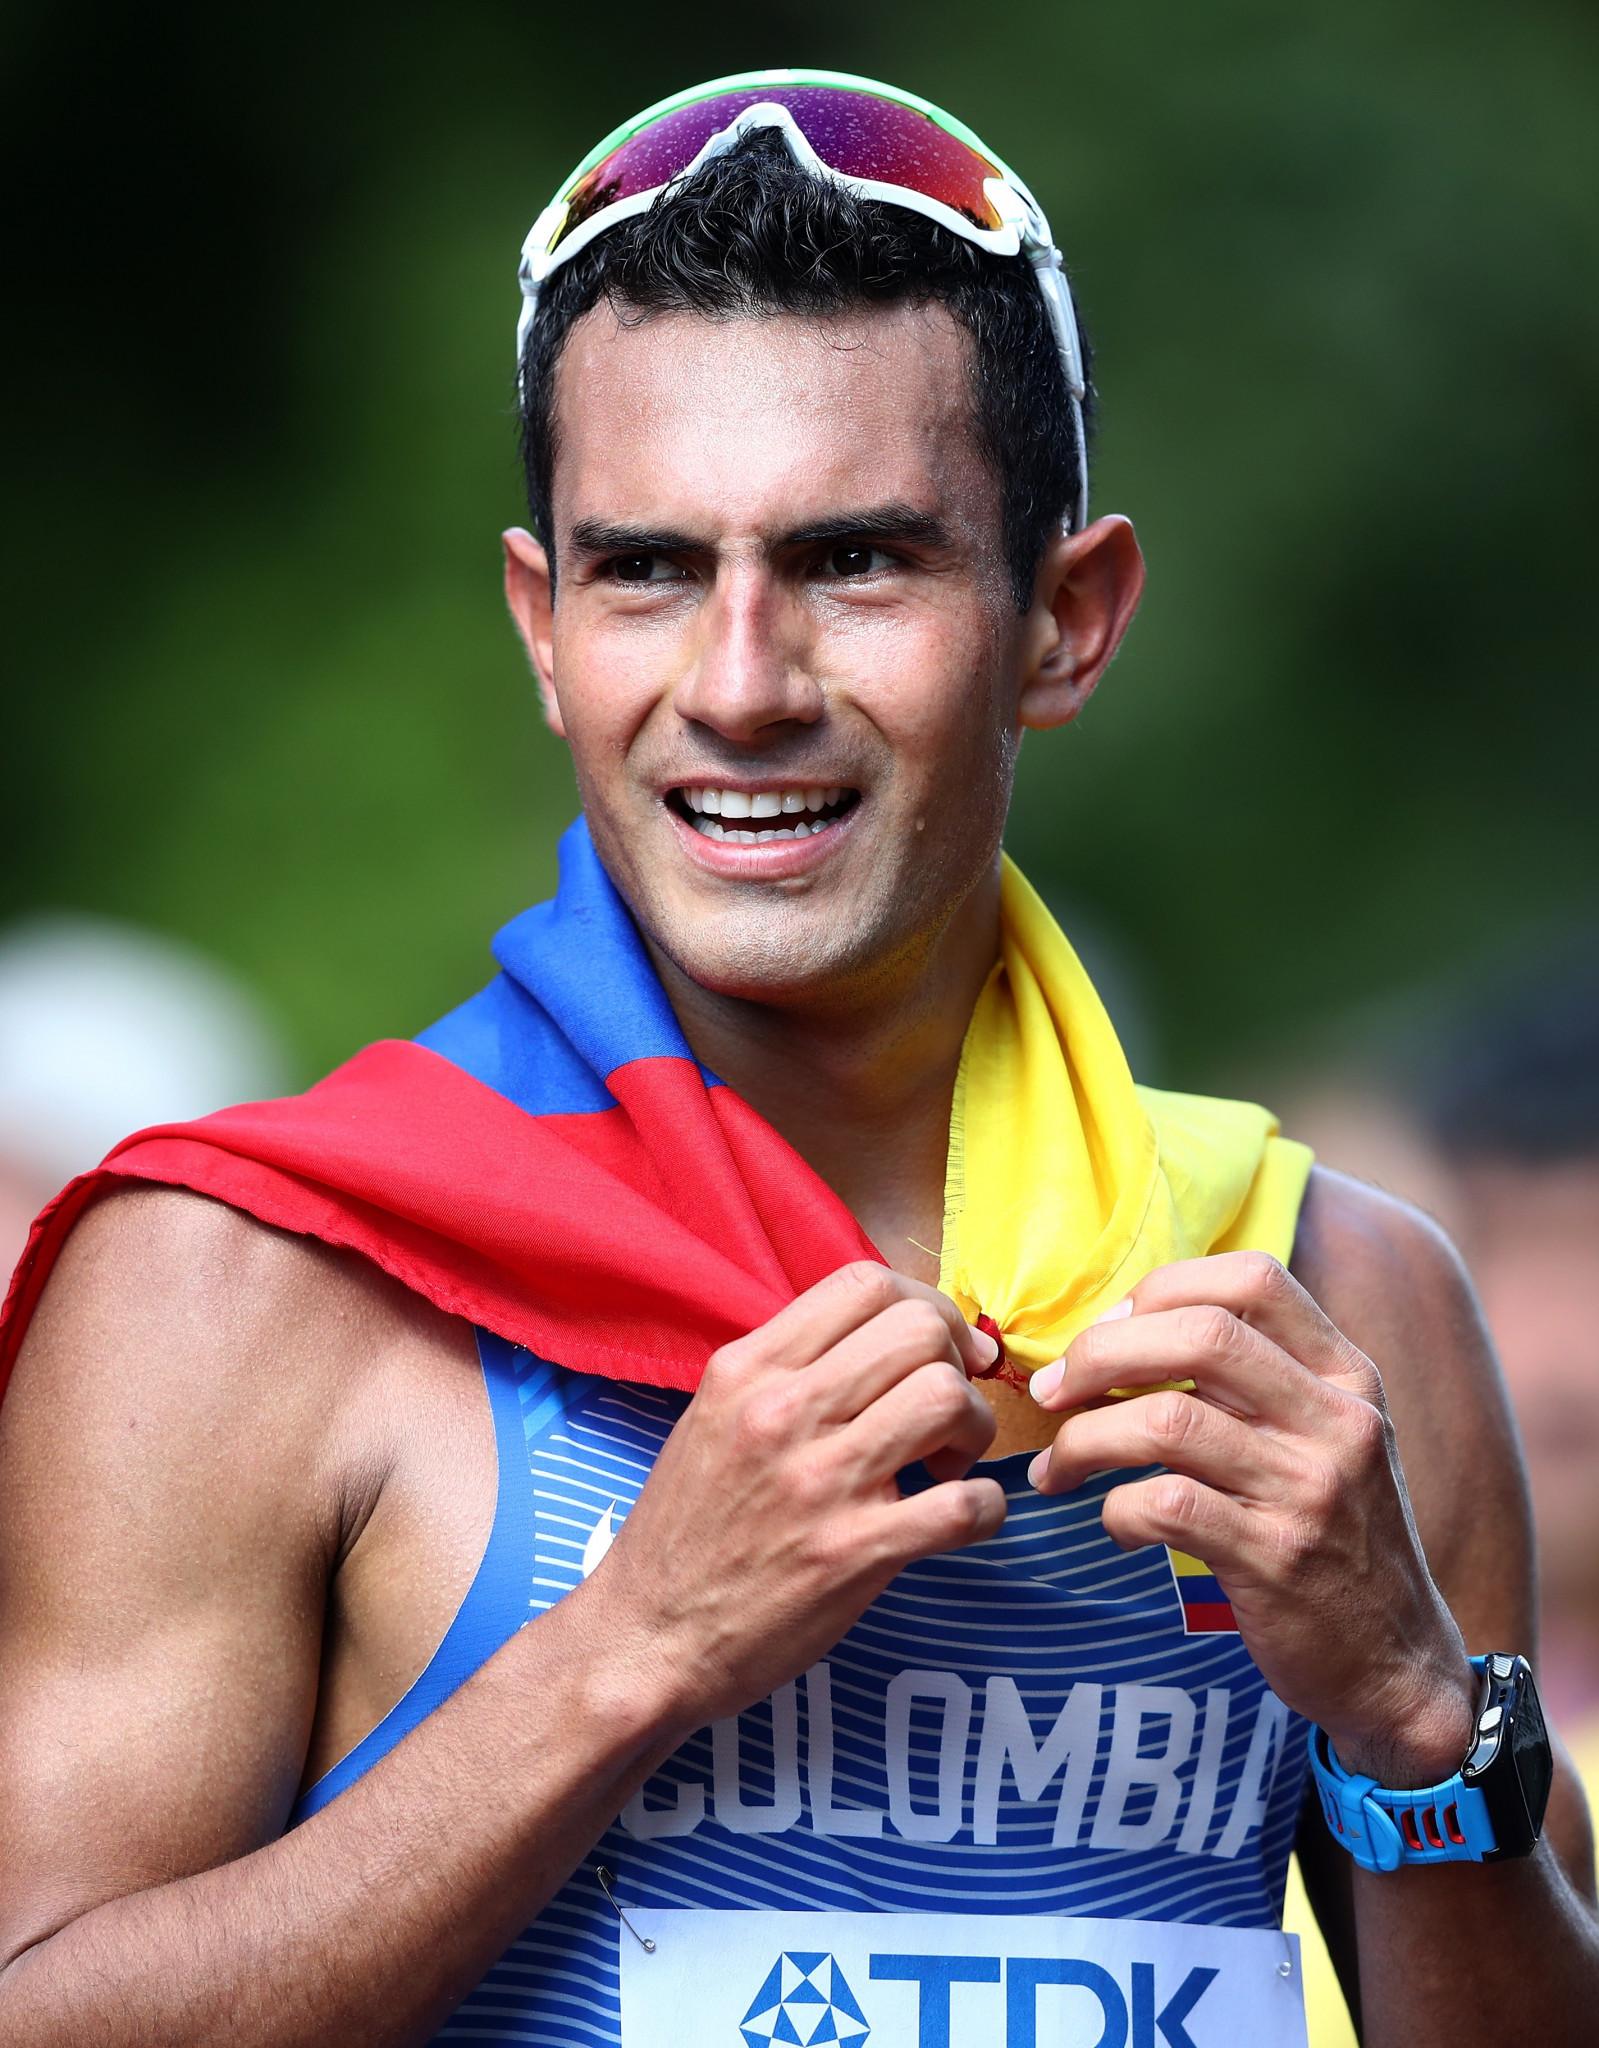 World champion Arévalo among field at IAAF Race Walking Challenge in La Coruña